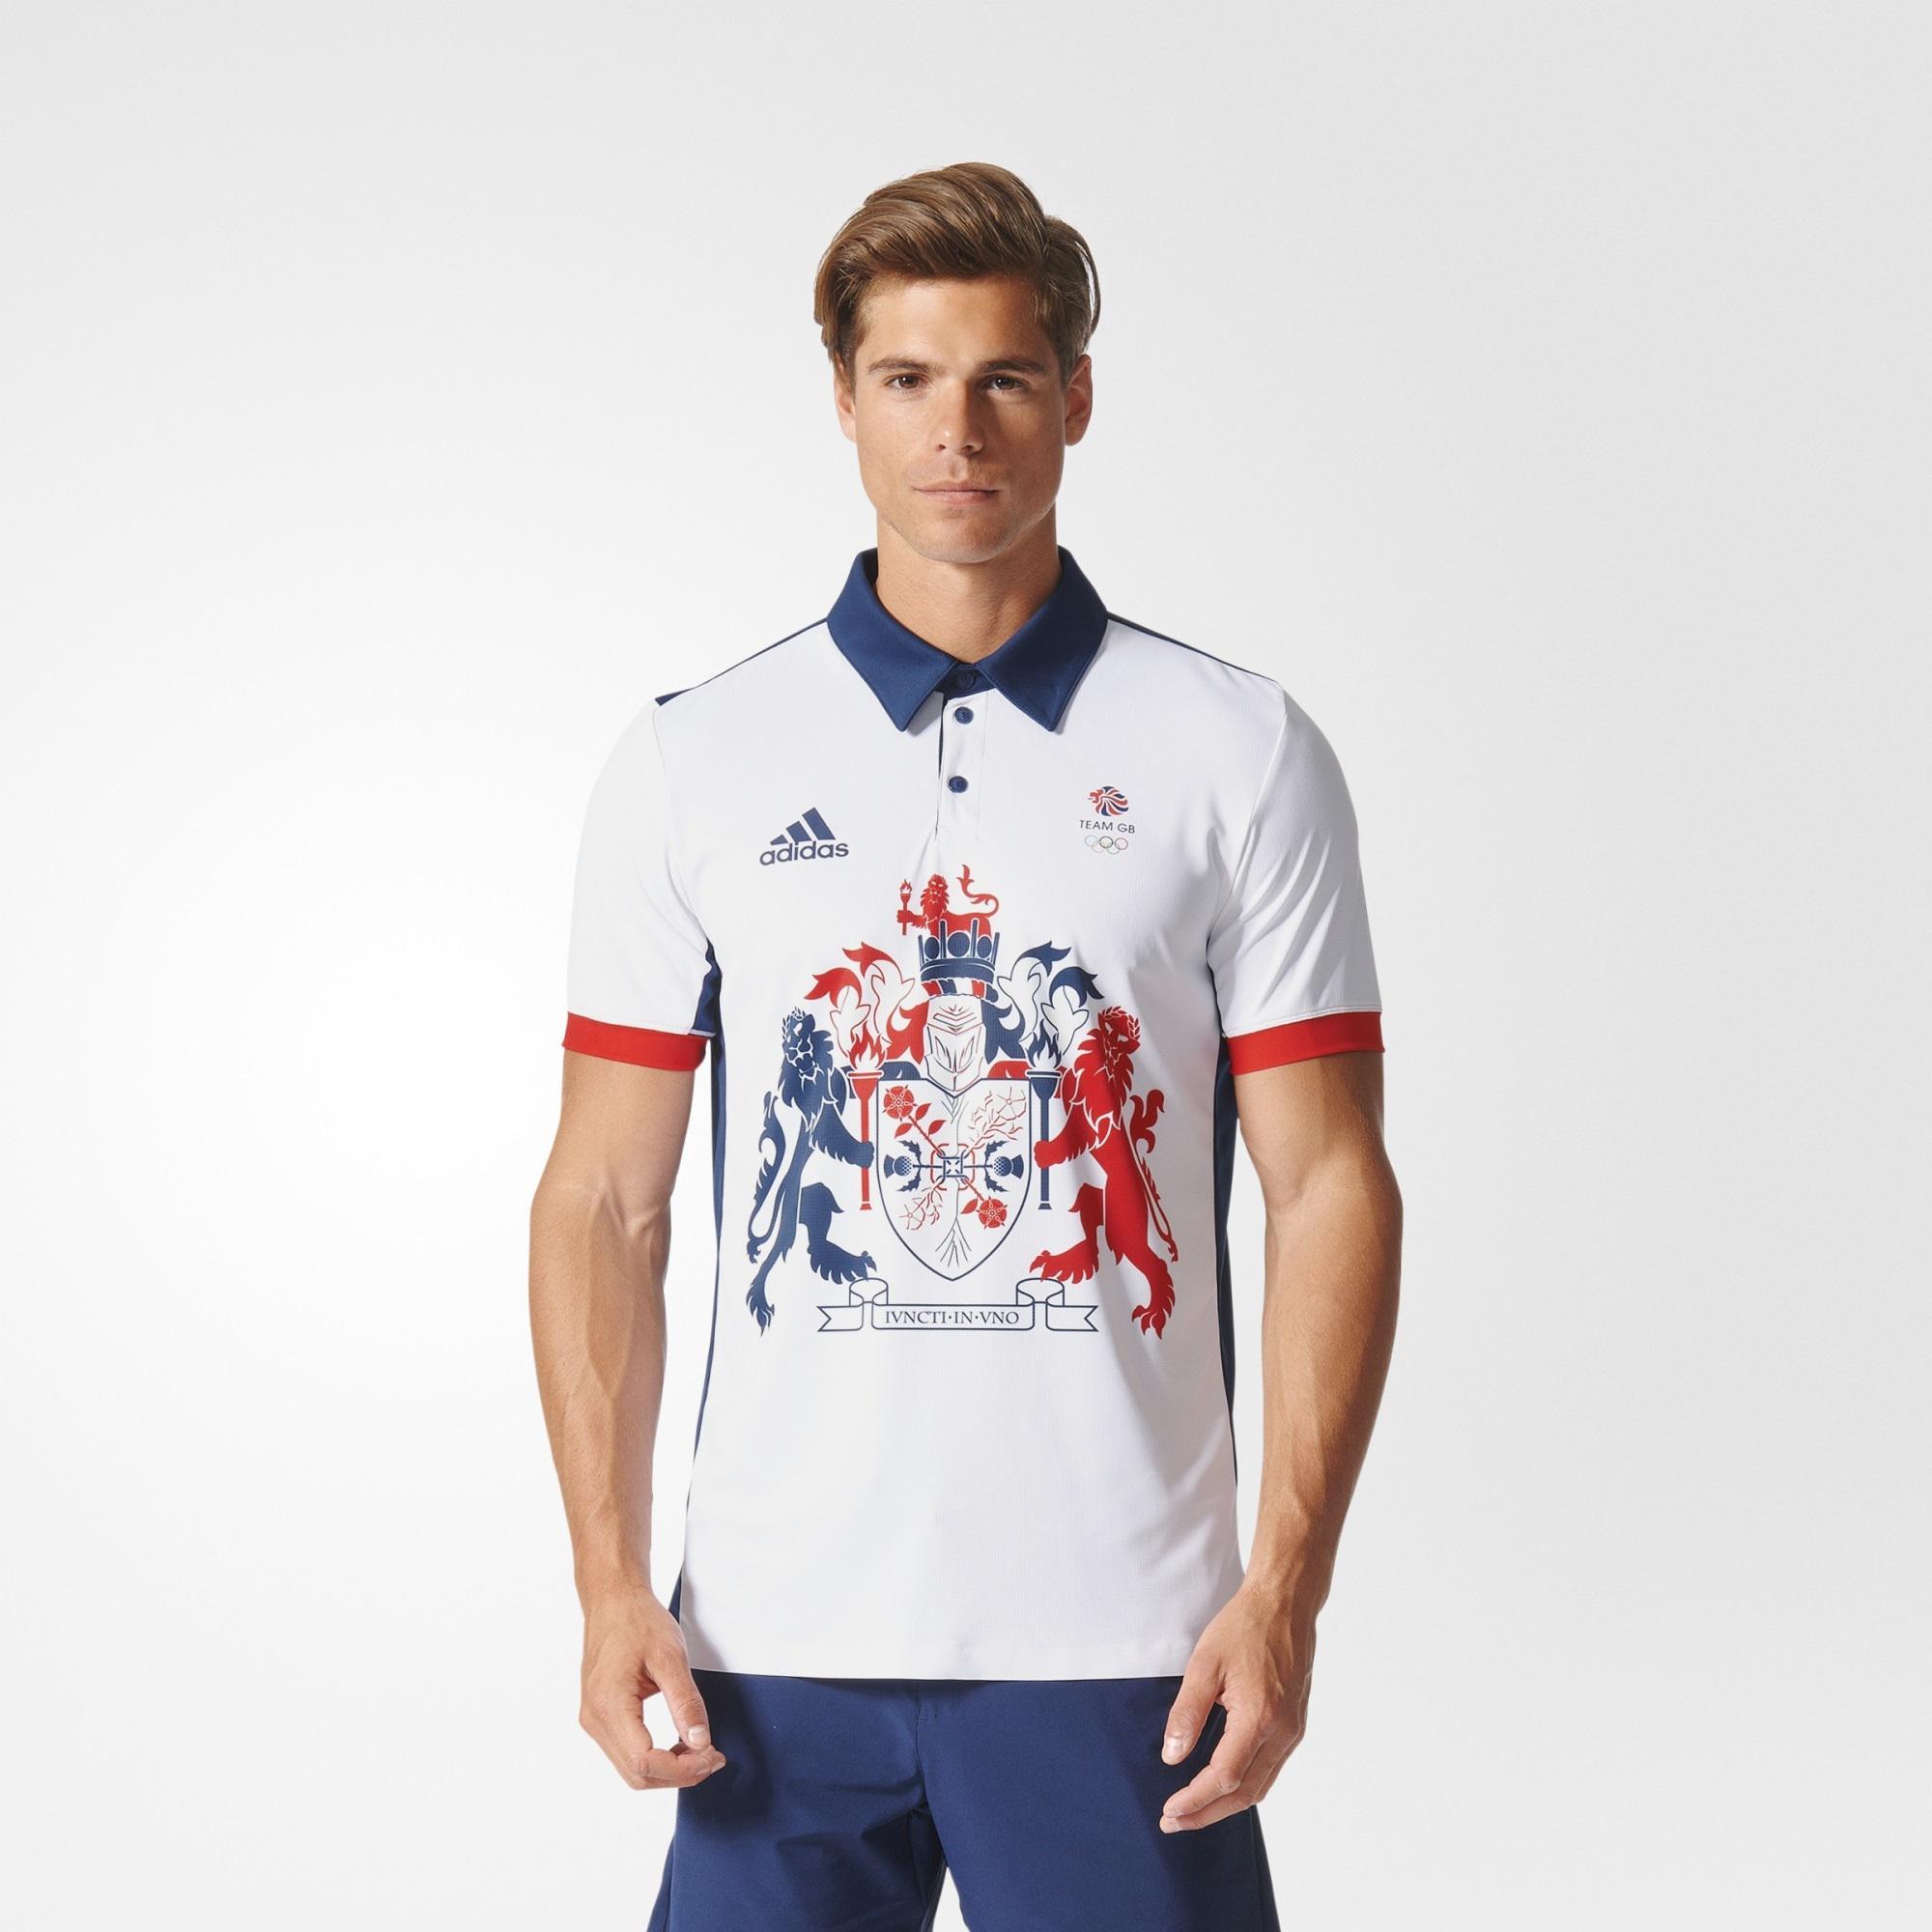 adidas team polo